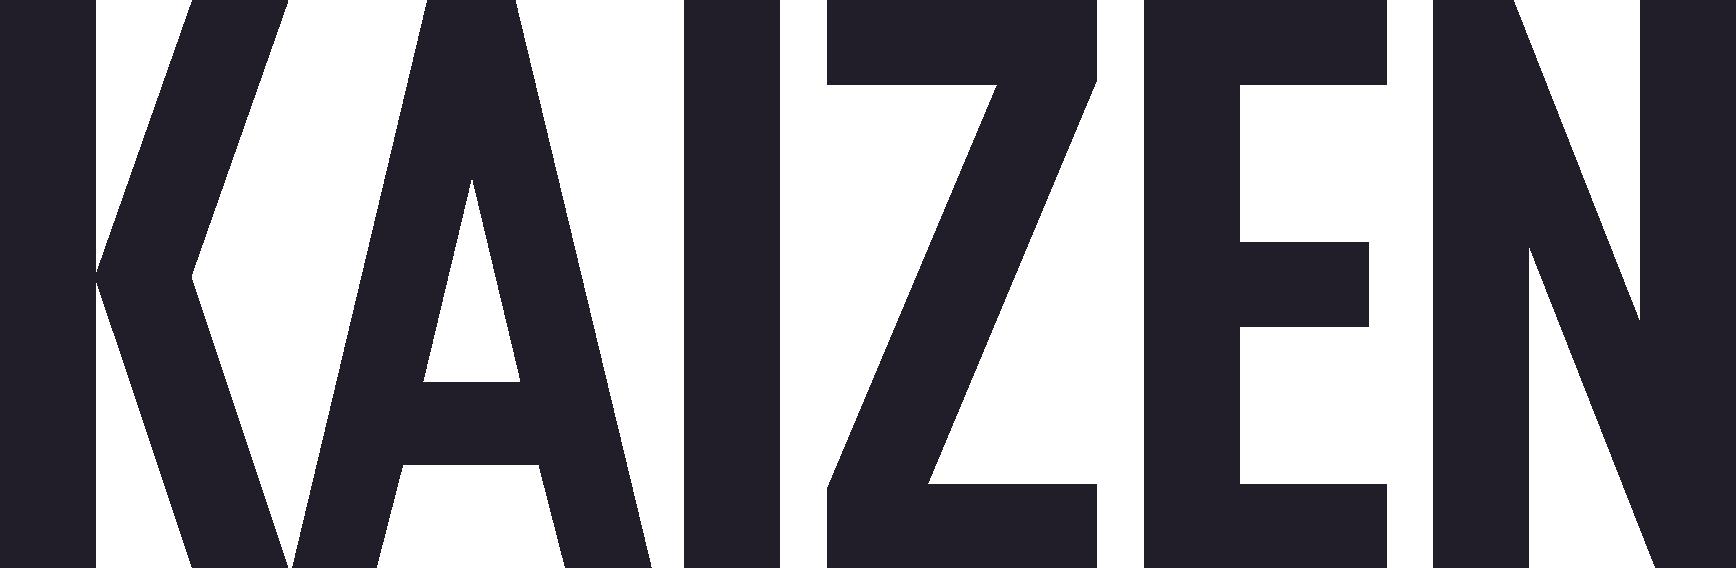 Kaizen_Logotype-Black -